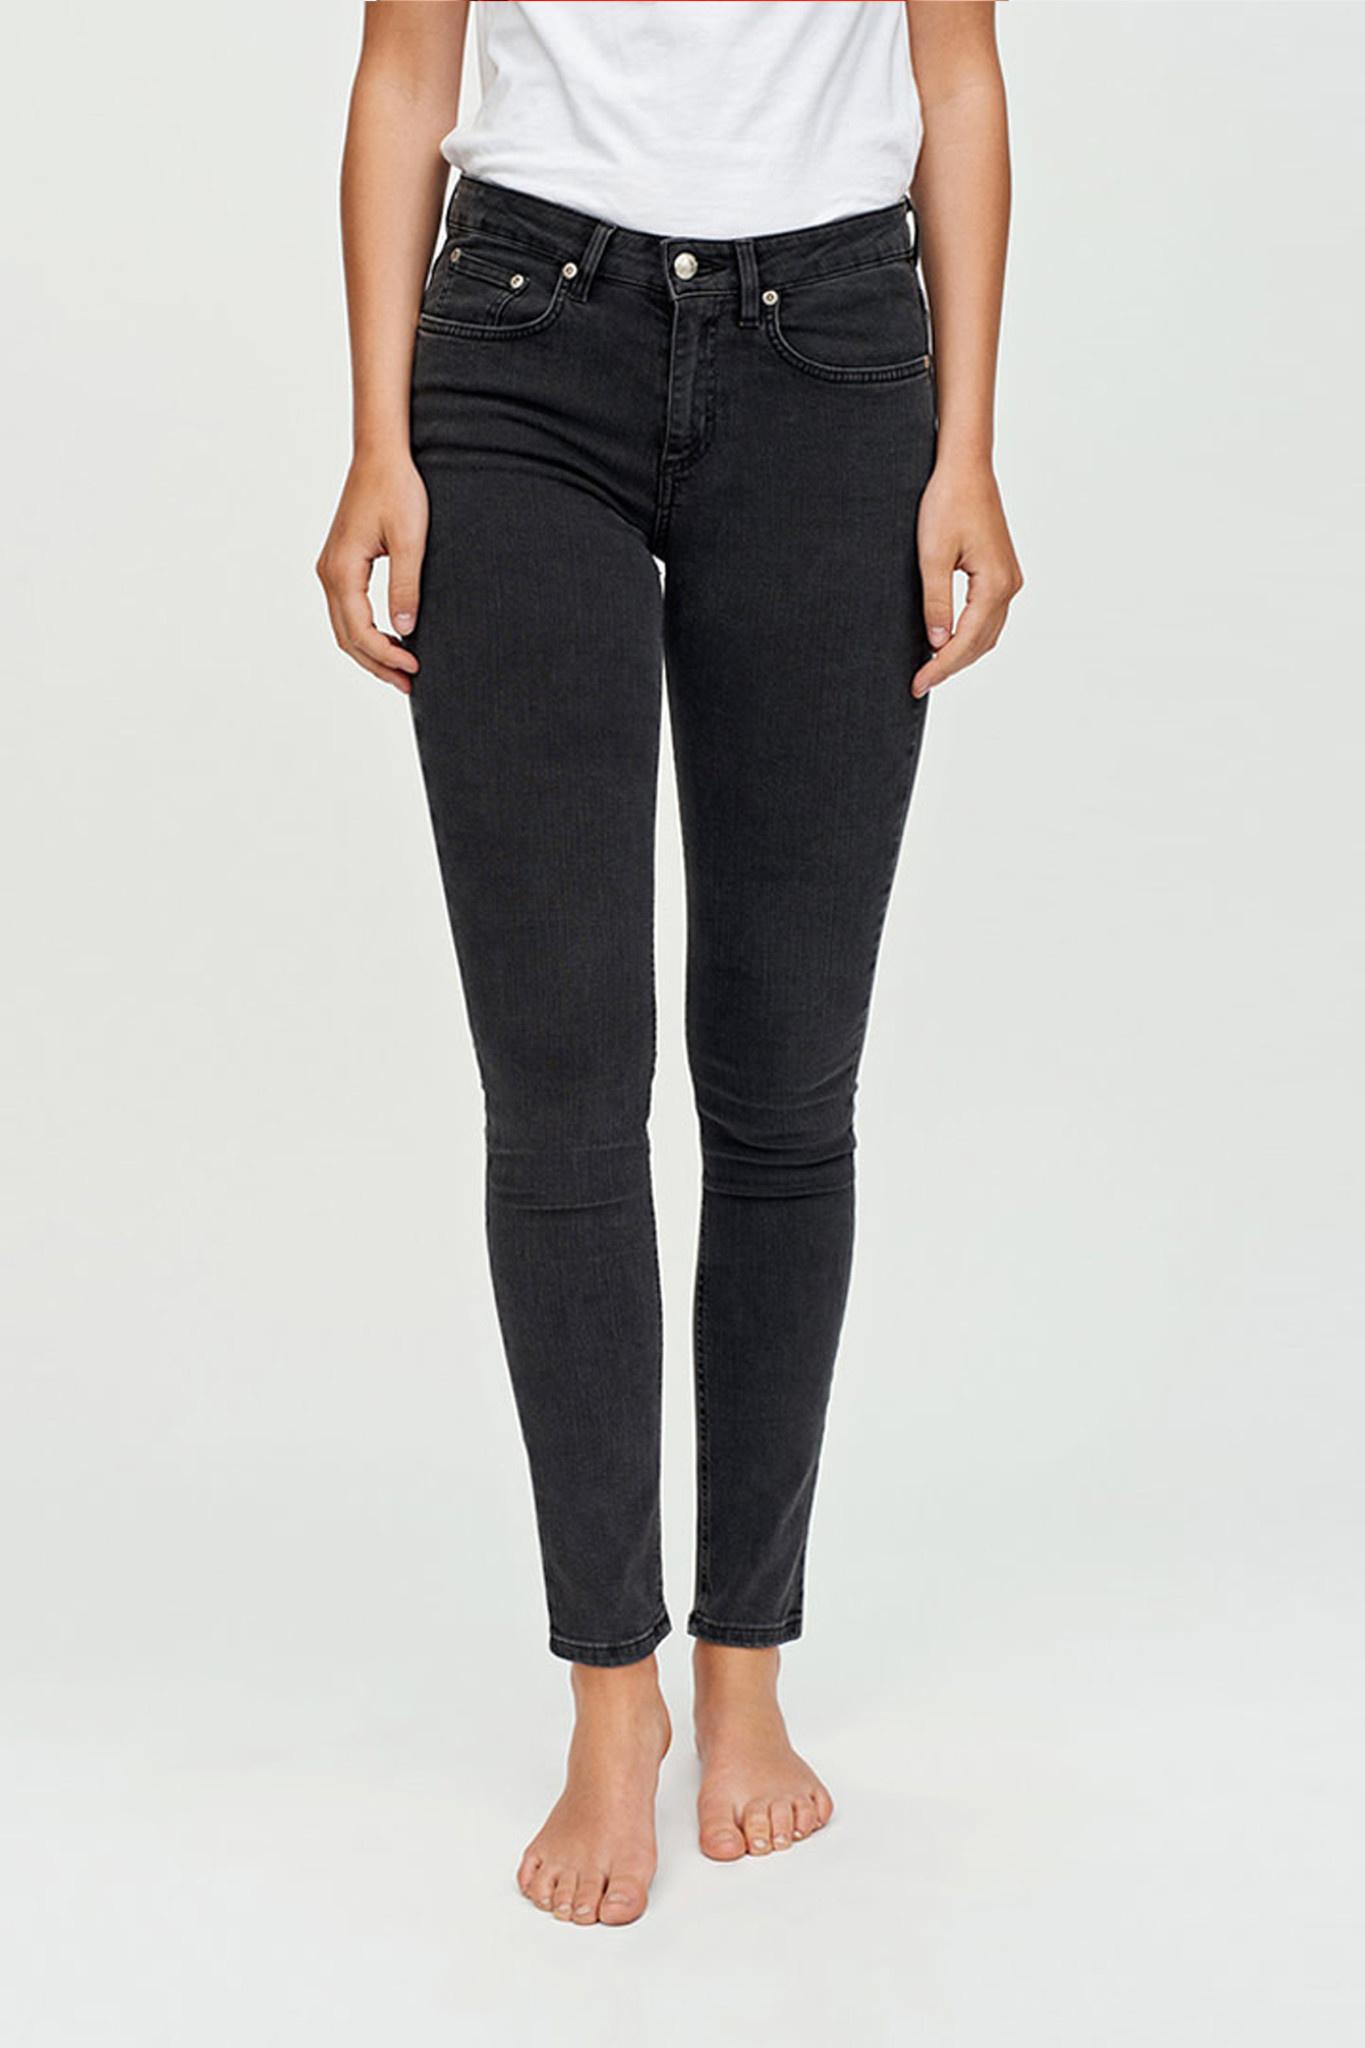 Patti B Jeans - Charcoal-1